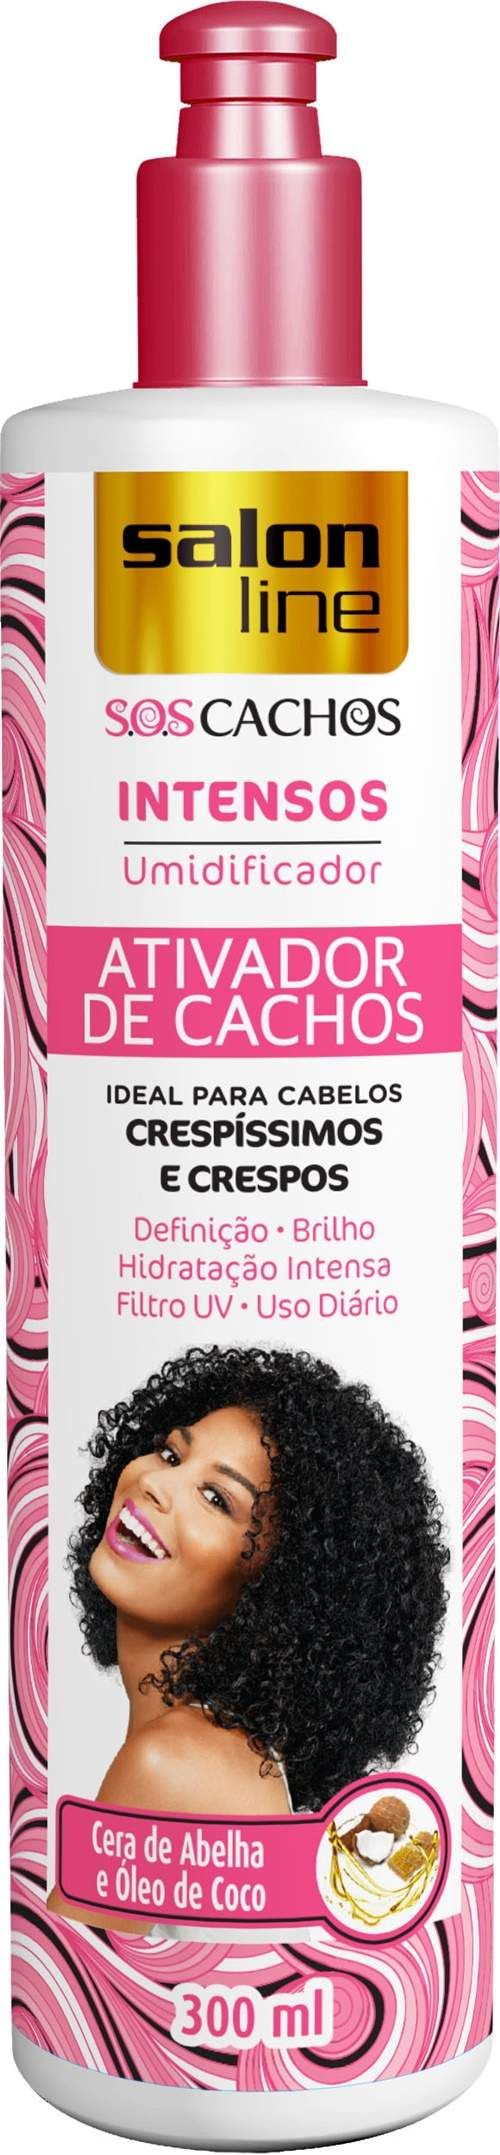 ATIVADOR DE CACHOS SALON LINE – UMIDIFICADOR INTENSO - SALON LINE